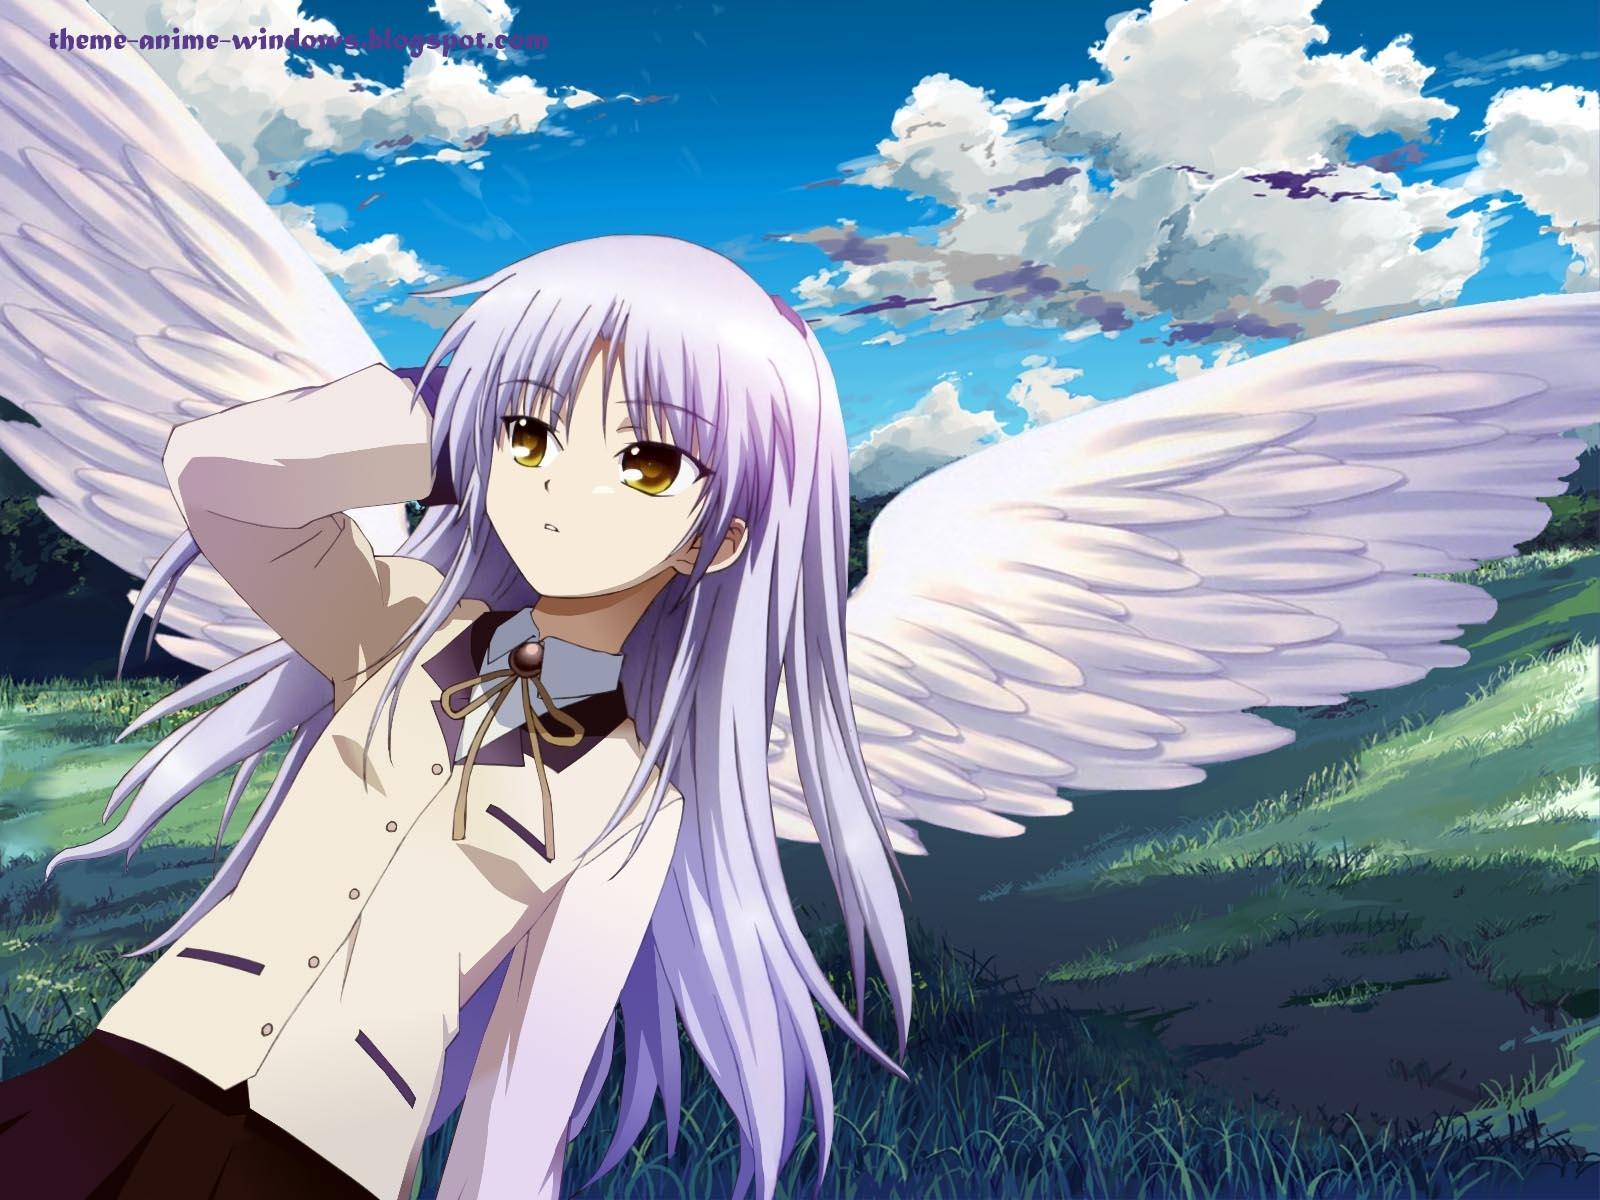 Angel Beats Op theme anime windows – angel beats – تحميل ثيم للأنمي الرئع